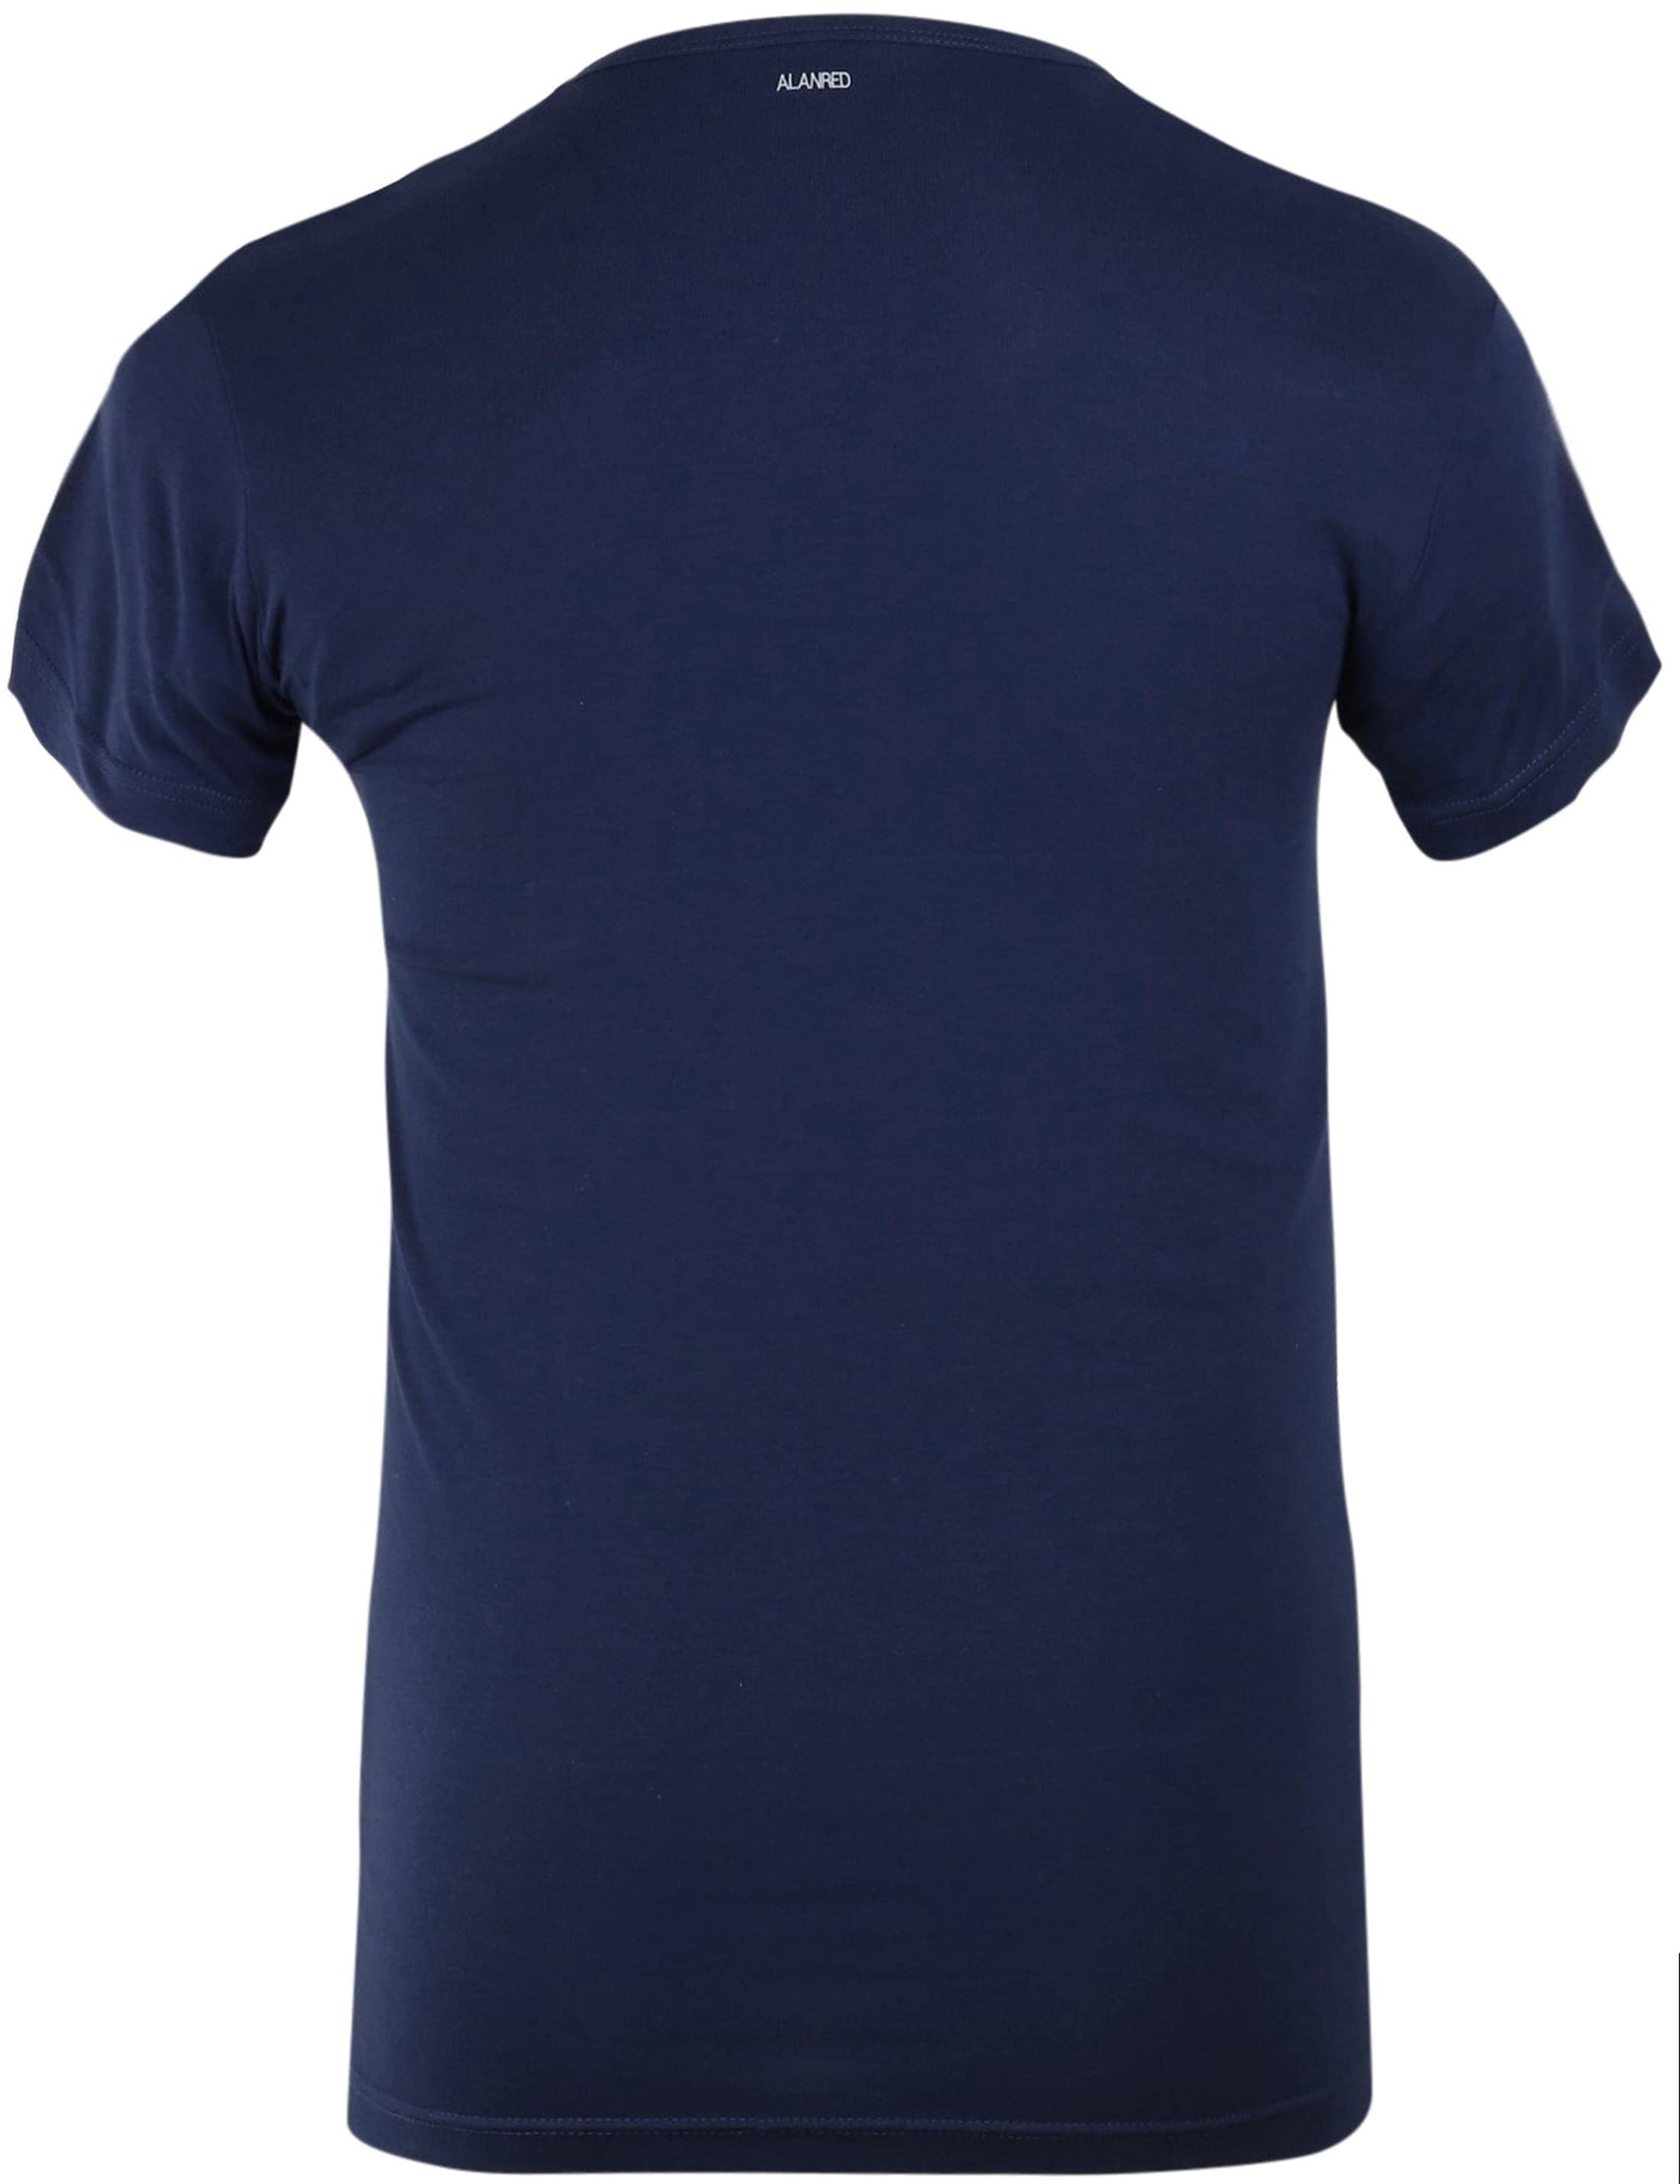 Alan Red Ottawa T-shirt Stretch Ultra Marine (2Pack) foto 2